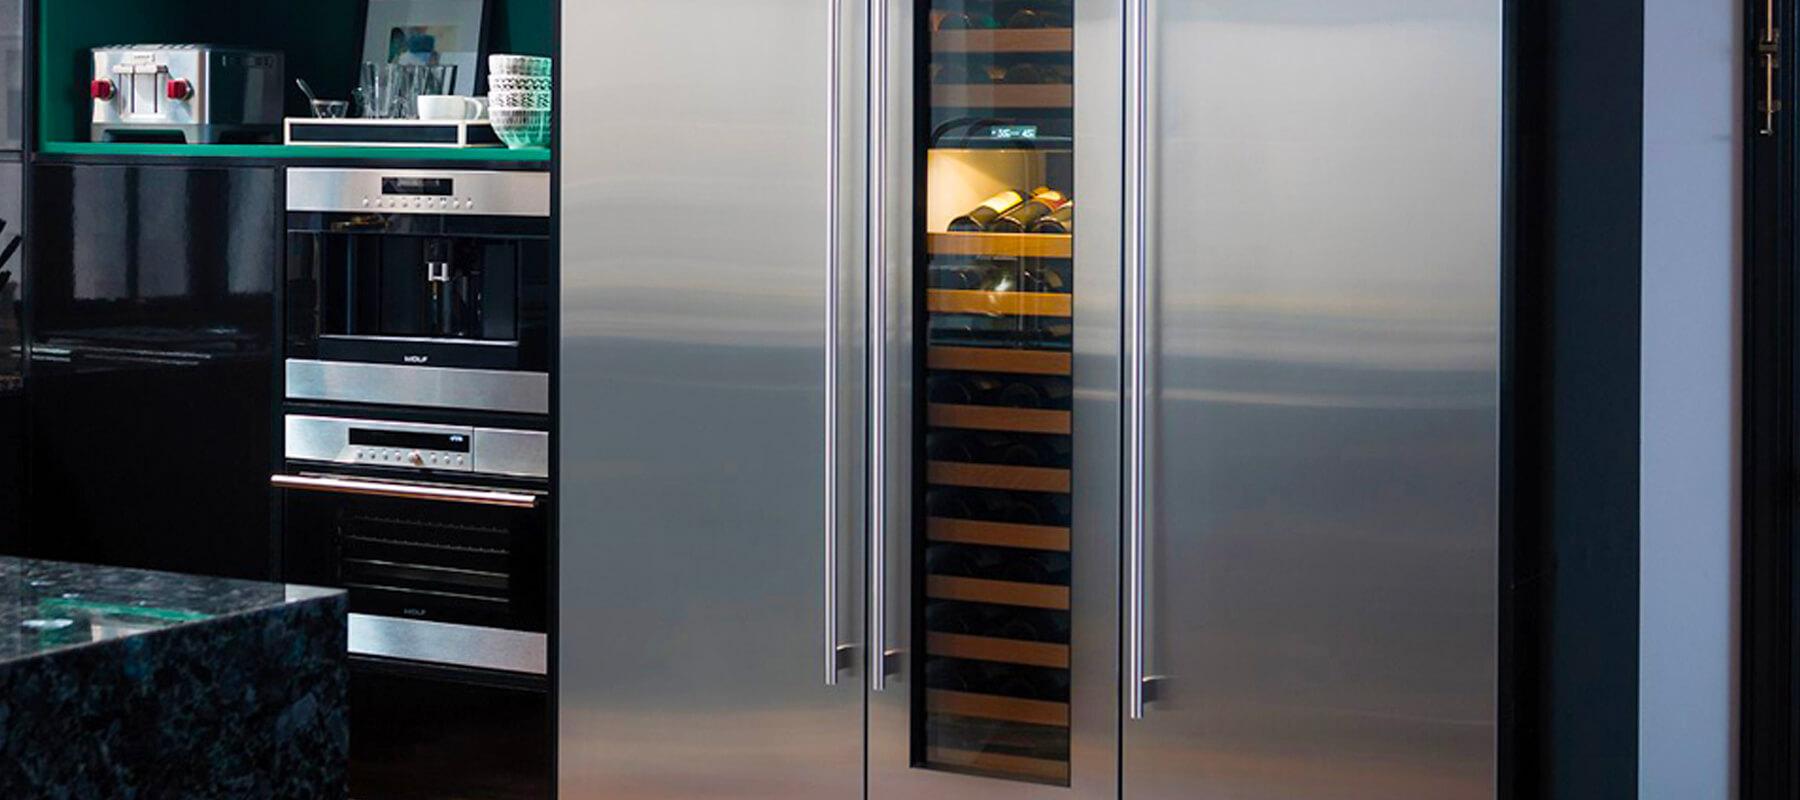 Built in Wine Refrigerator Mission Viejo | Built-in Refrigerator Repair